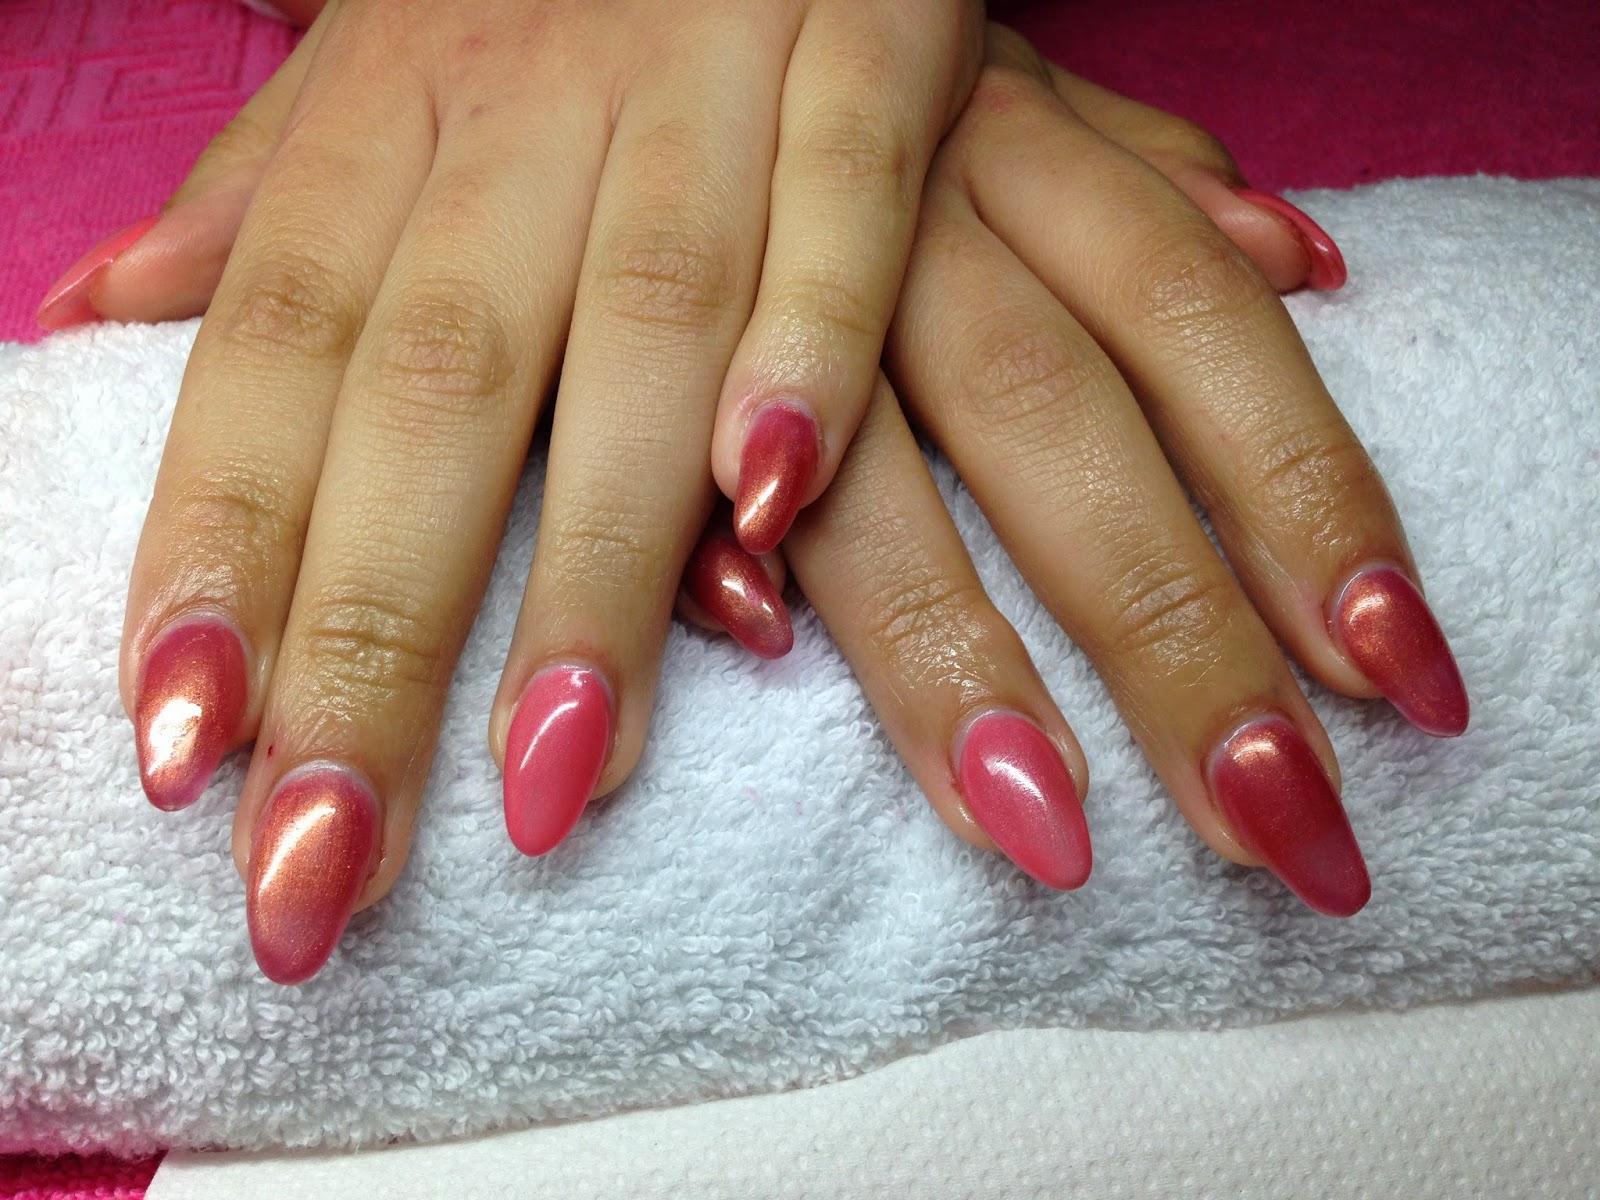 Crystal Kiss Nails by U.K: Almond gel nails & hybrid colour